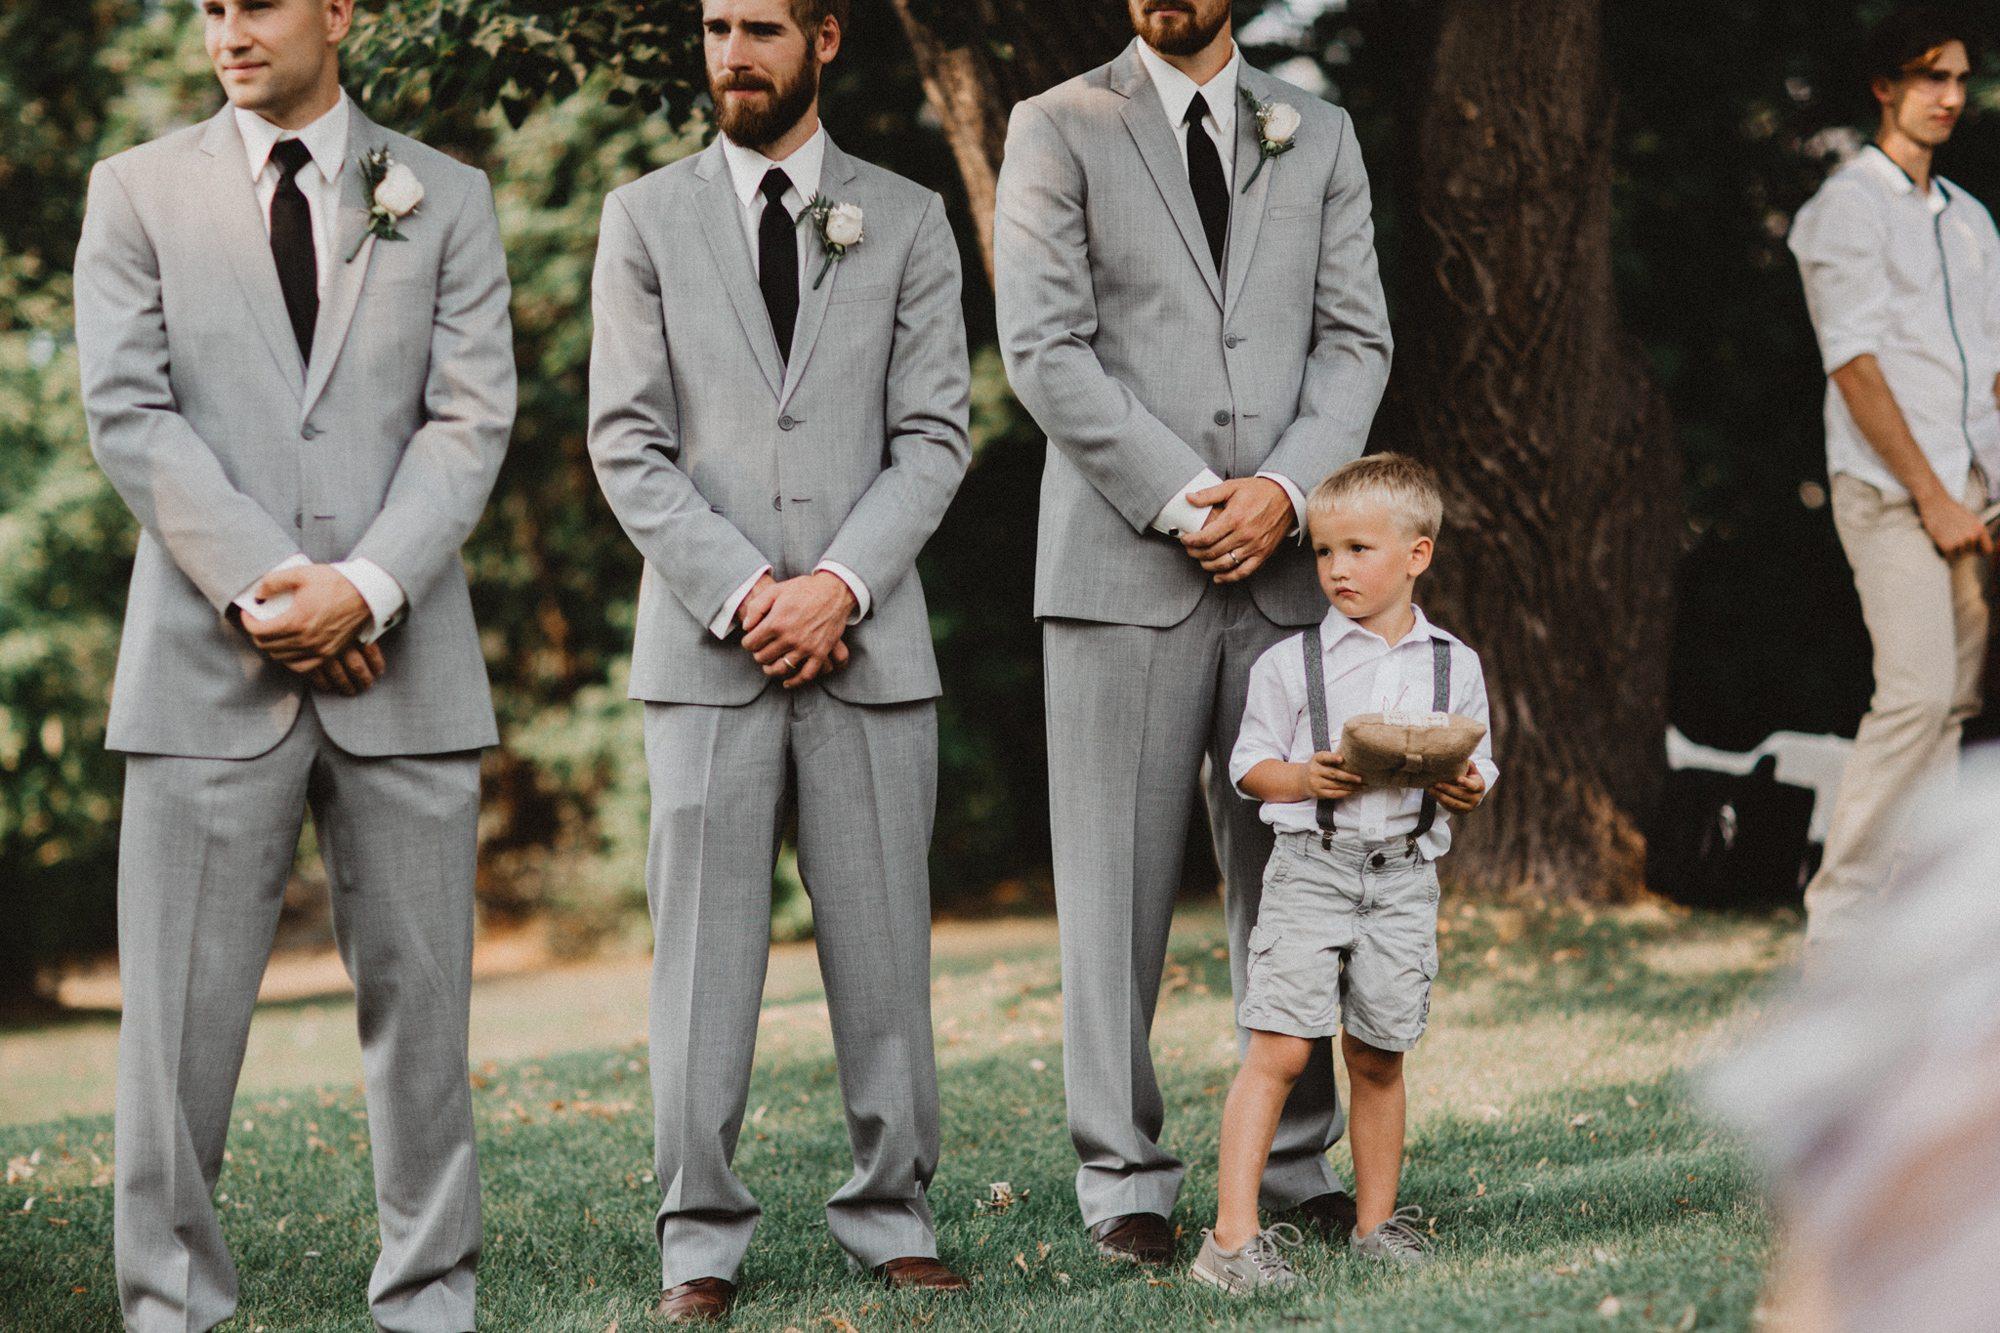 458-vernon-wedding-photographer